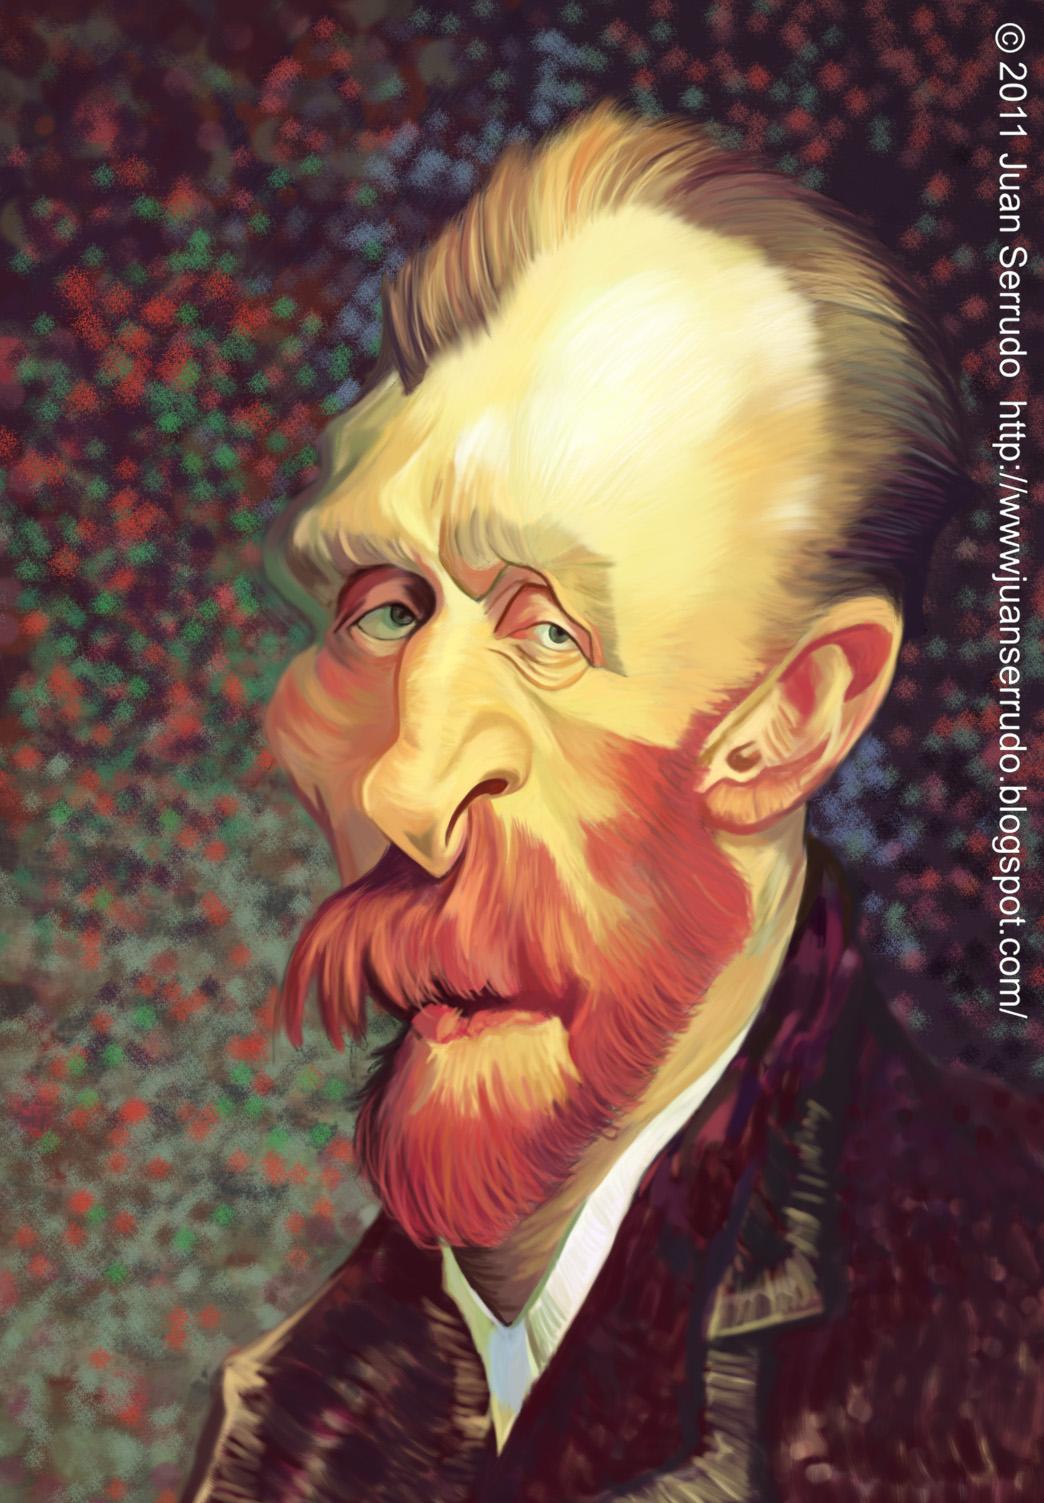 http://4.bp.blogspot.com/-G4ks24GUirM/TpGMggD4ZkI/AAAAAAAAAgw/qKjEF9-y8rE/s1600/Van+Gogh.jpg